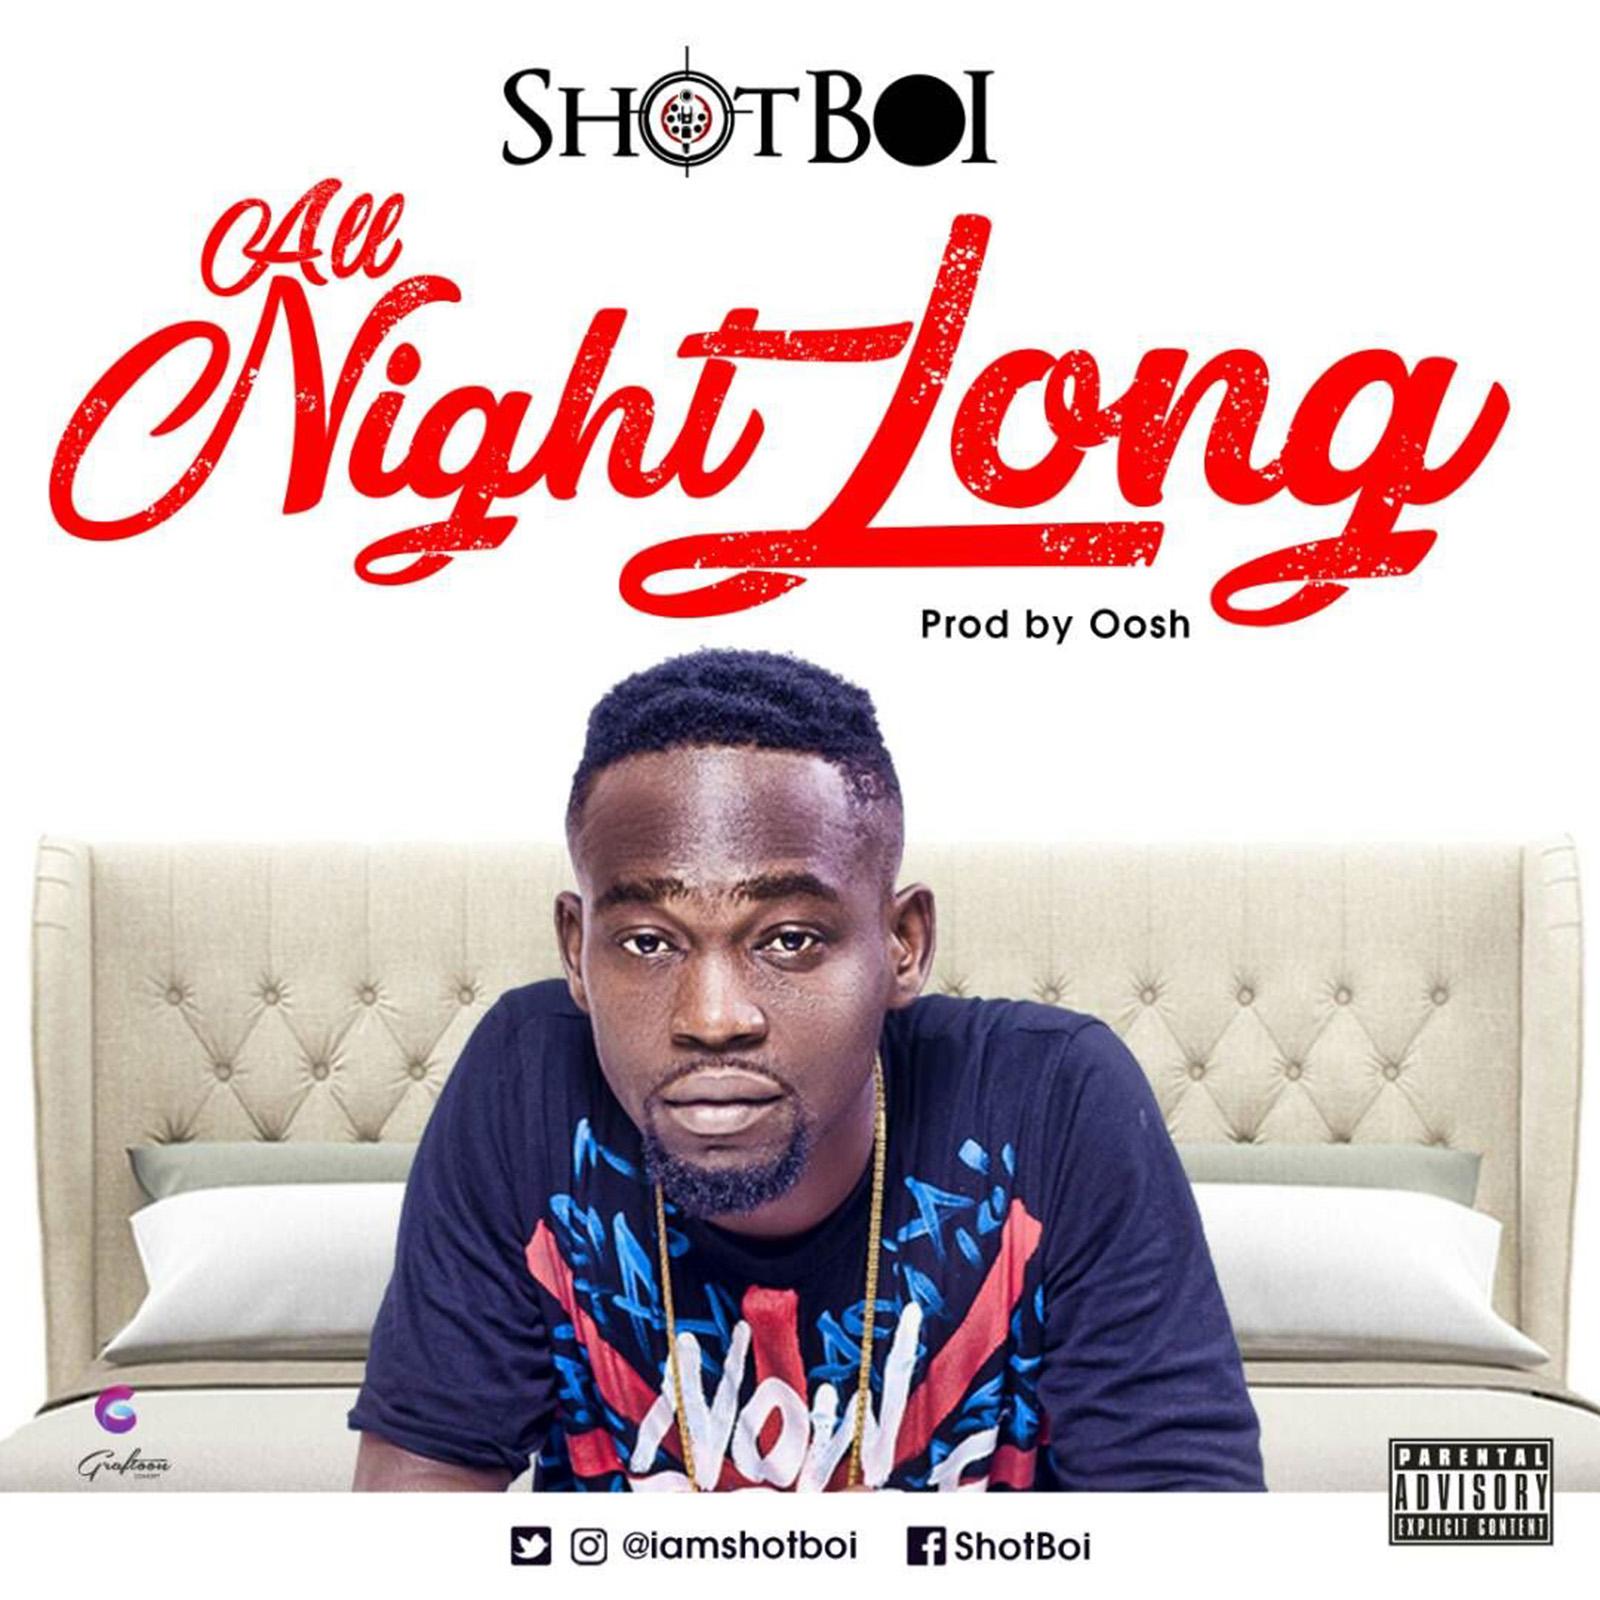 All Night Long by ShotBoi